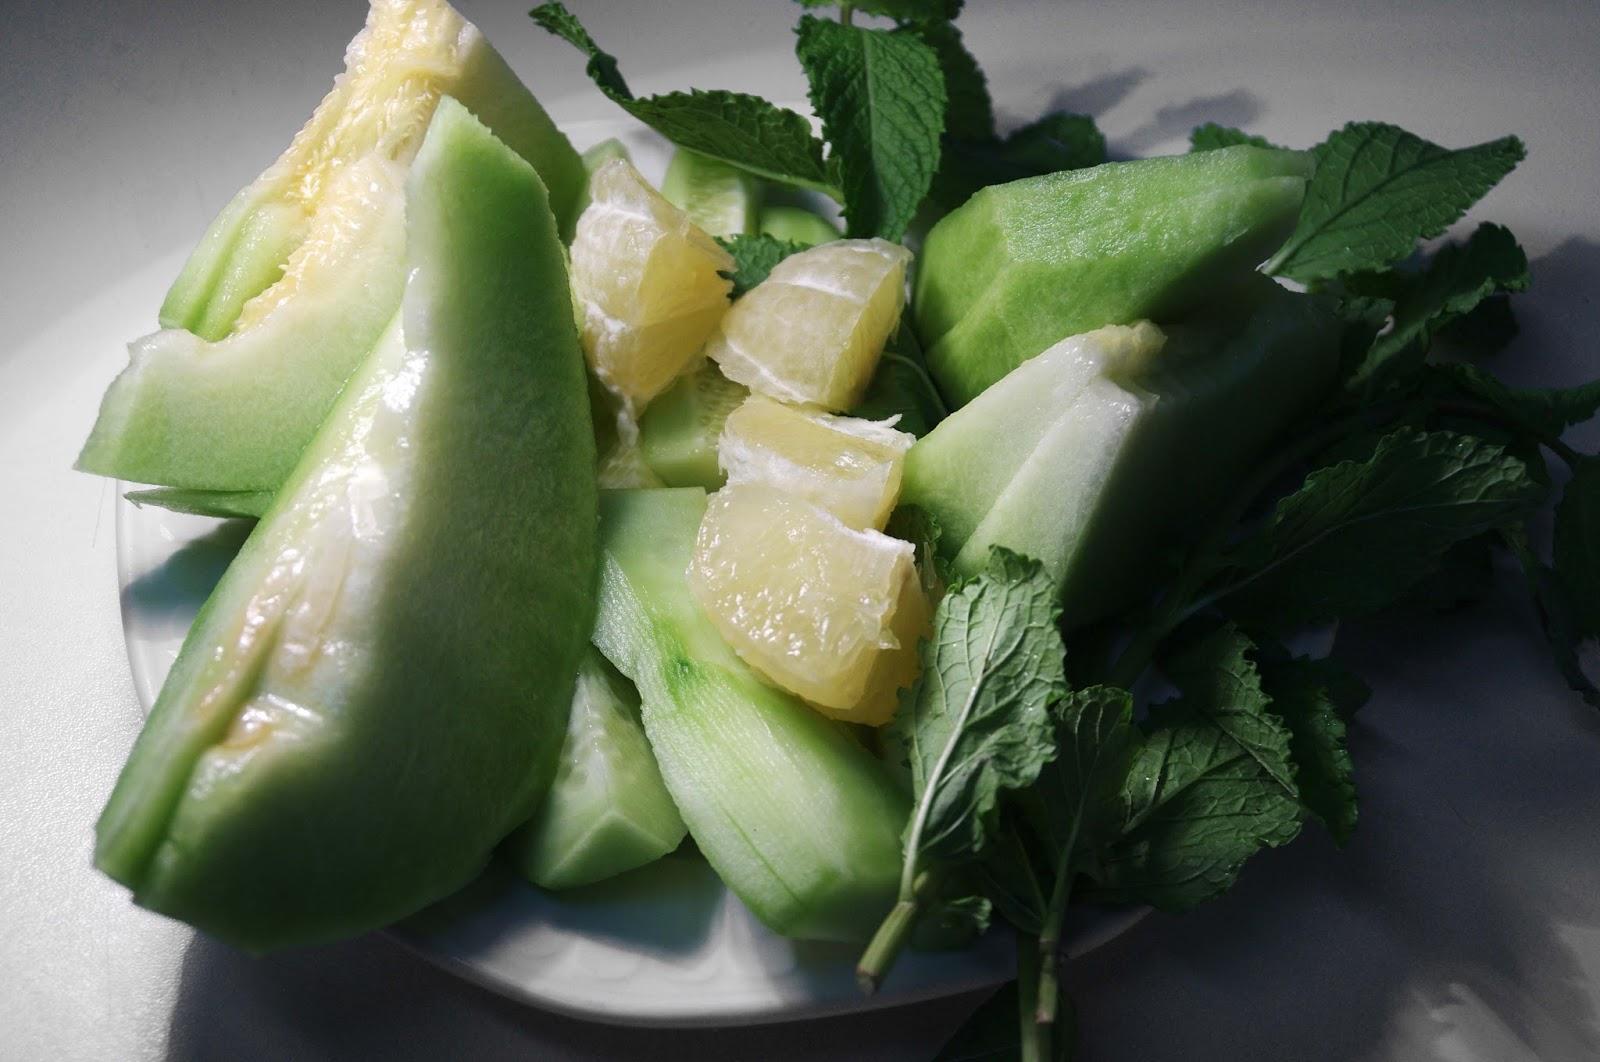 cortamos melón, limón y pepino